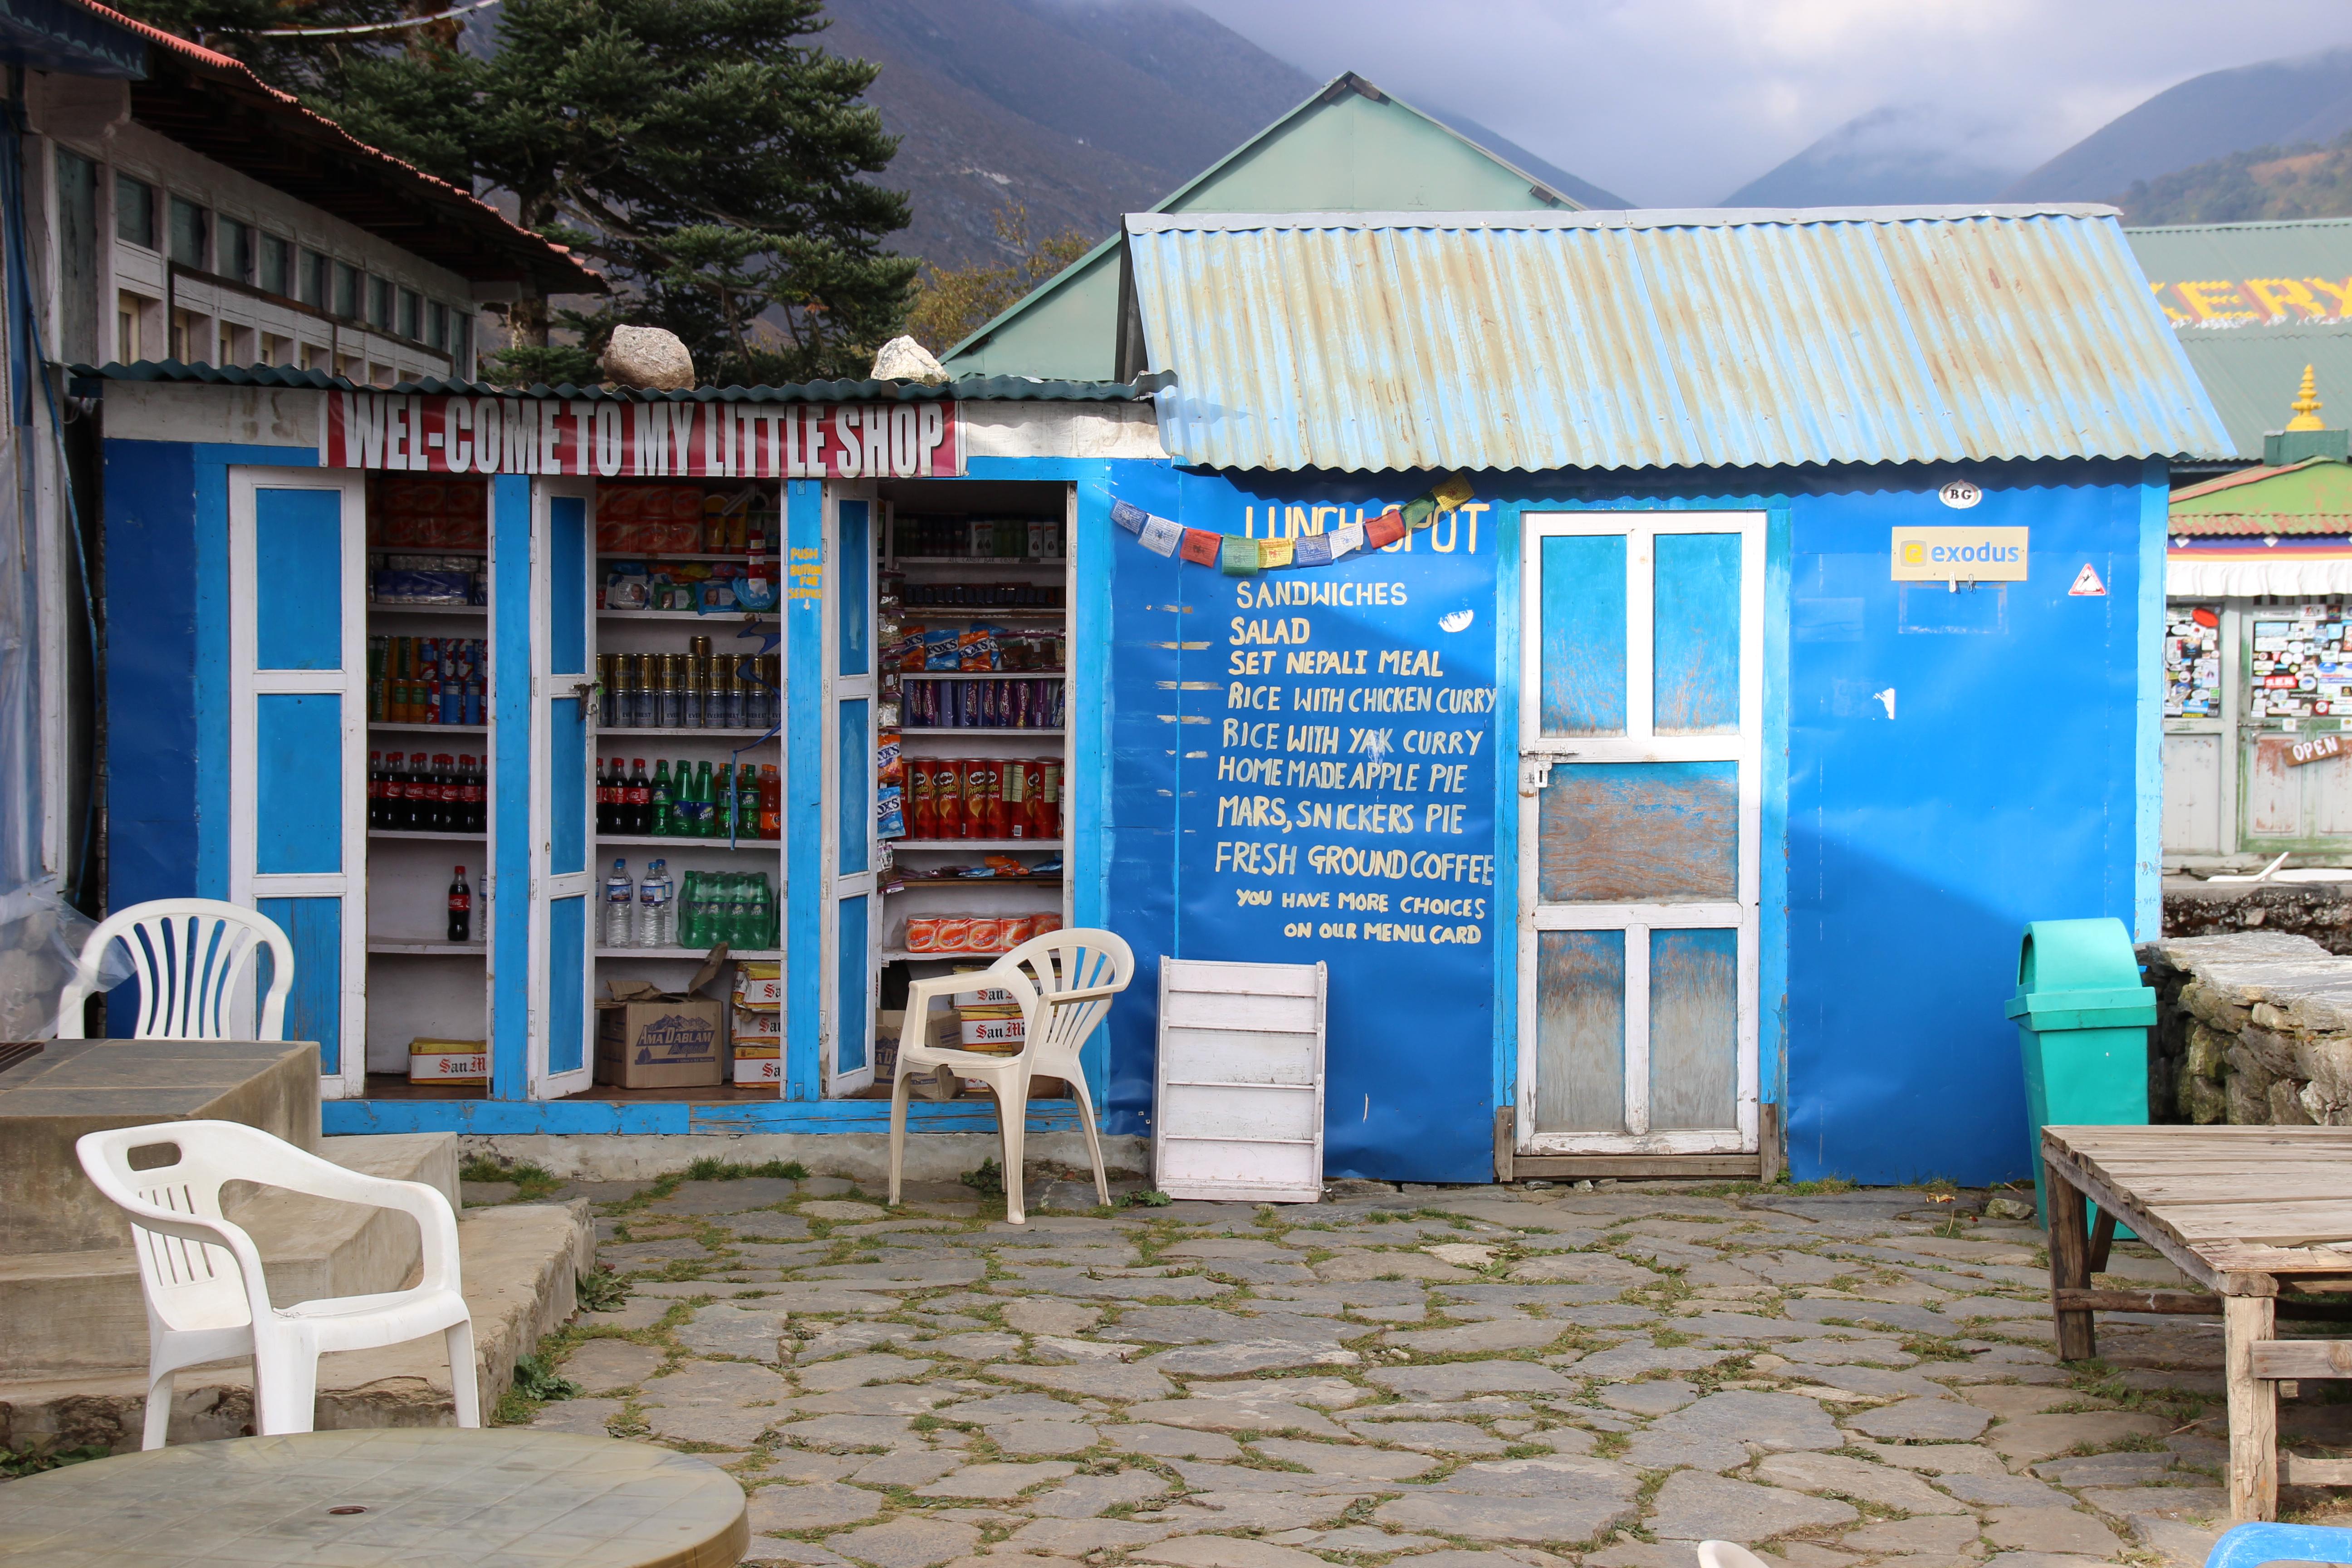 My Little Shop